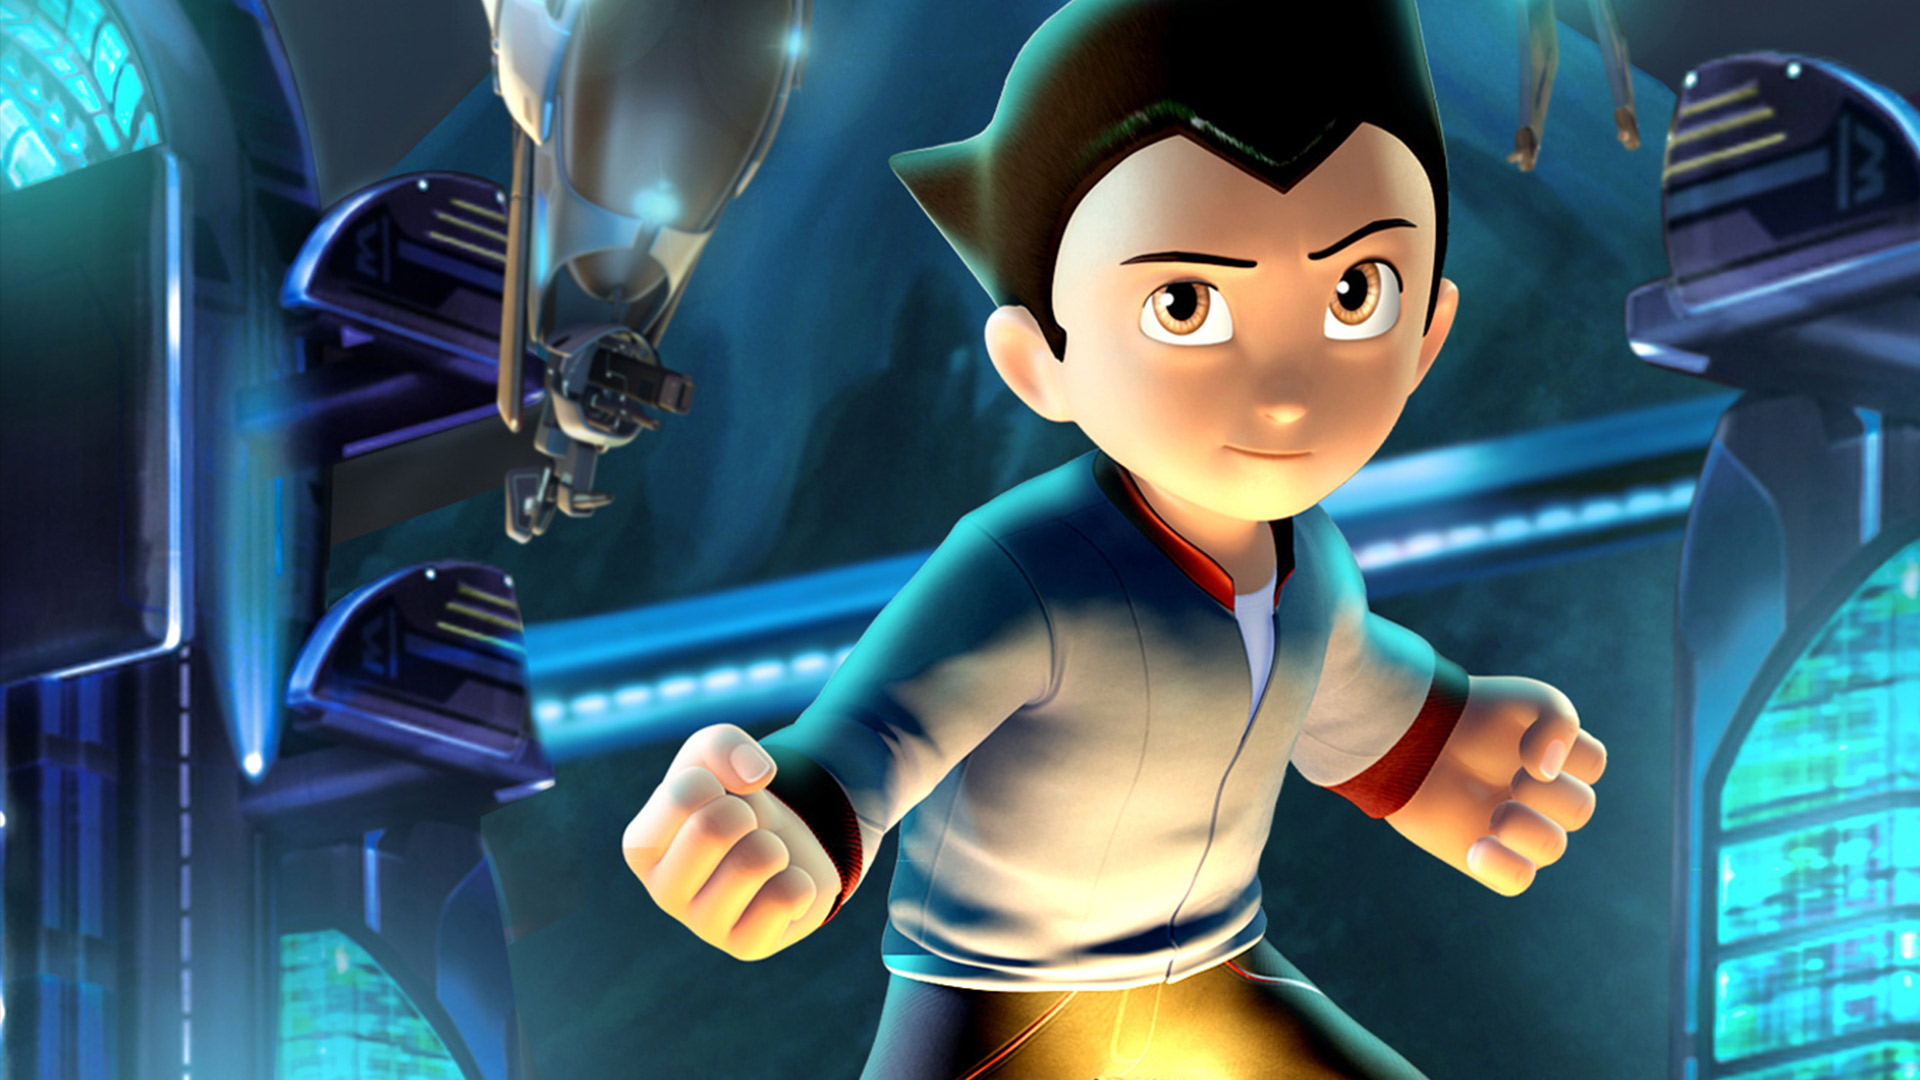 Watch Astro Boy Prime Video